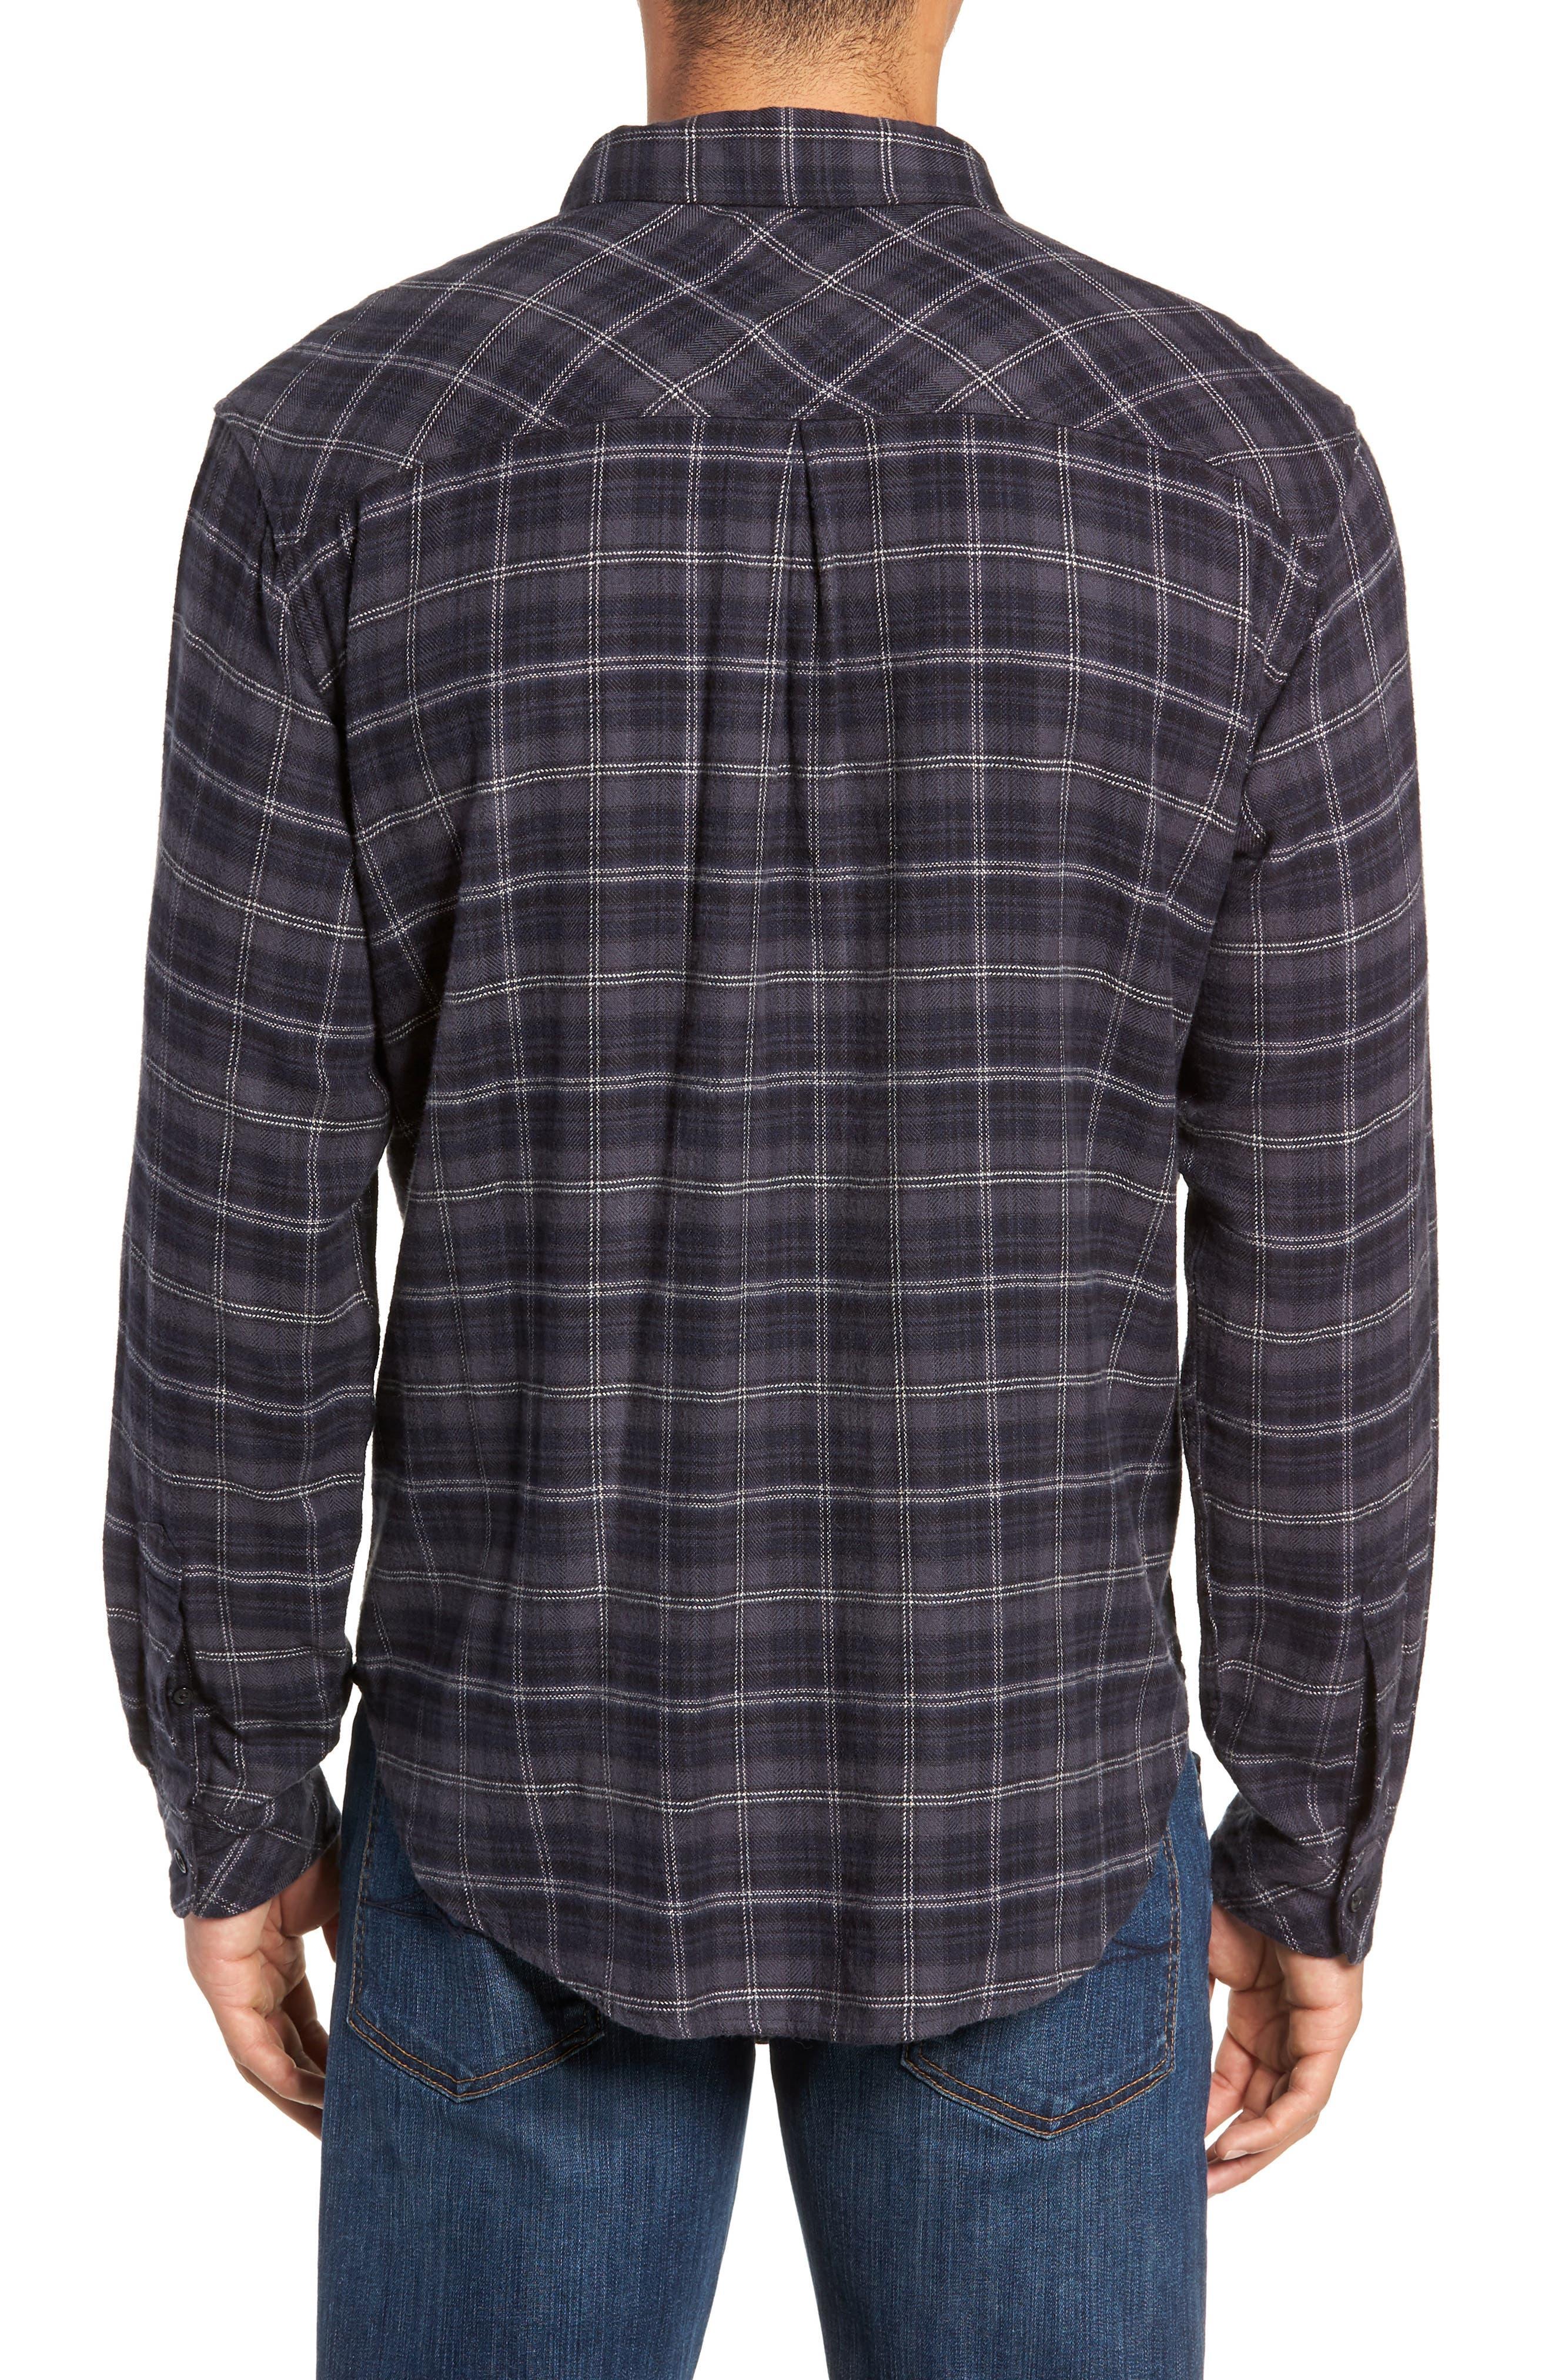 Lennox Slim Fit Plaid Sport Shirt,                             Alternate thumbnail 3, color,                             BLUE SMOKE/NAVY/BLACK